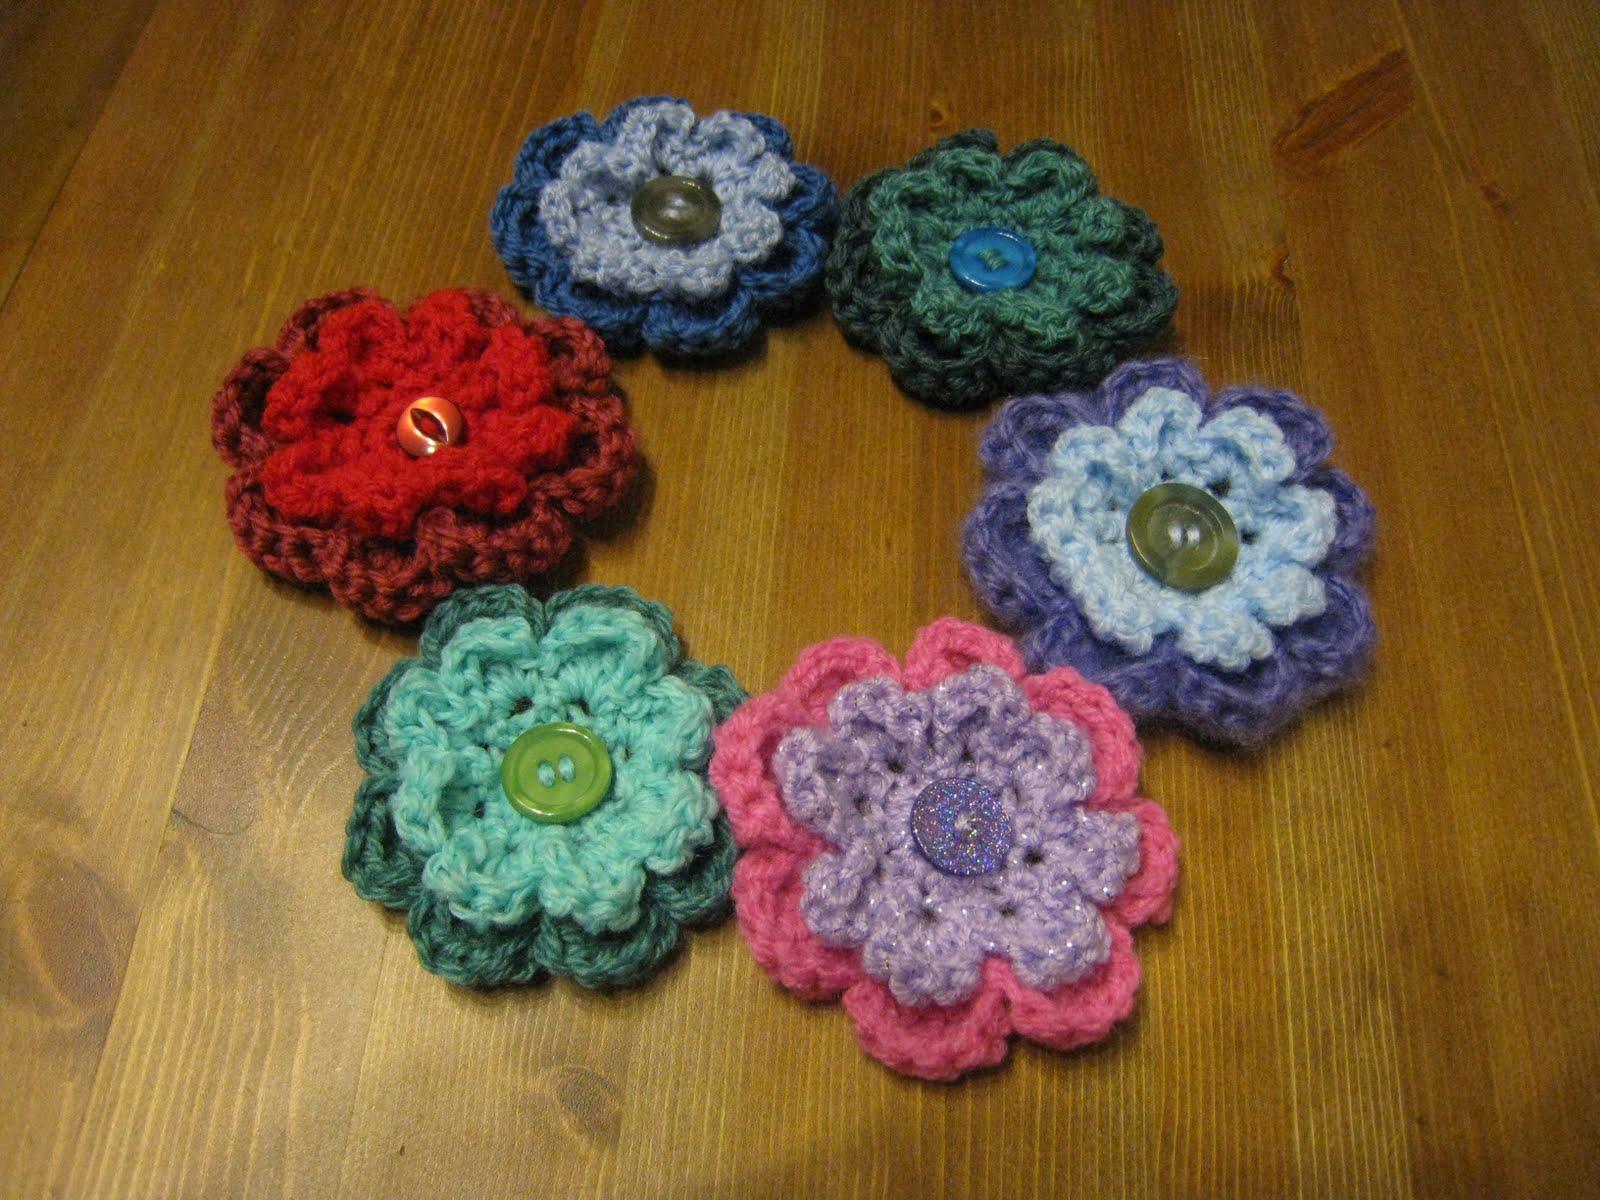 Crochet A Flower Brooch Pattern : Crochet boobs for cancer pt.: Flower brooch by Jessica Felton